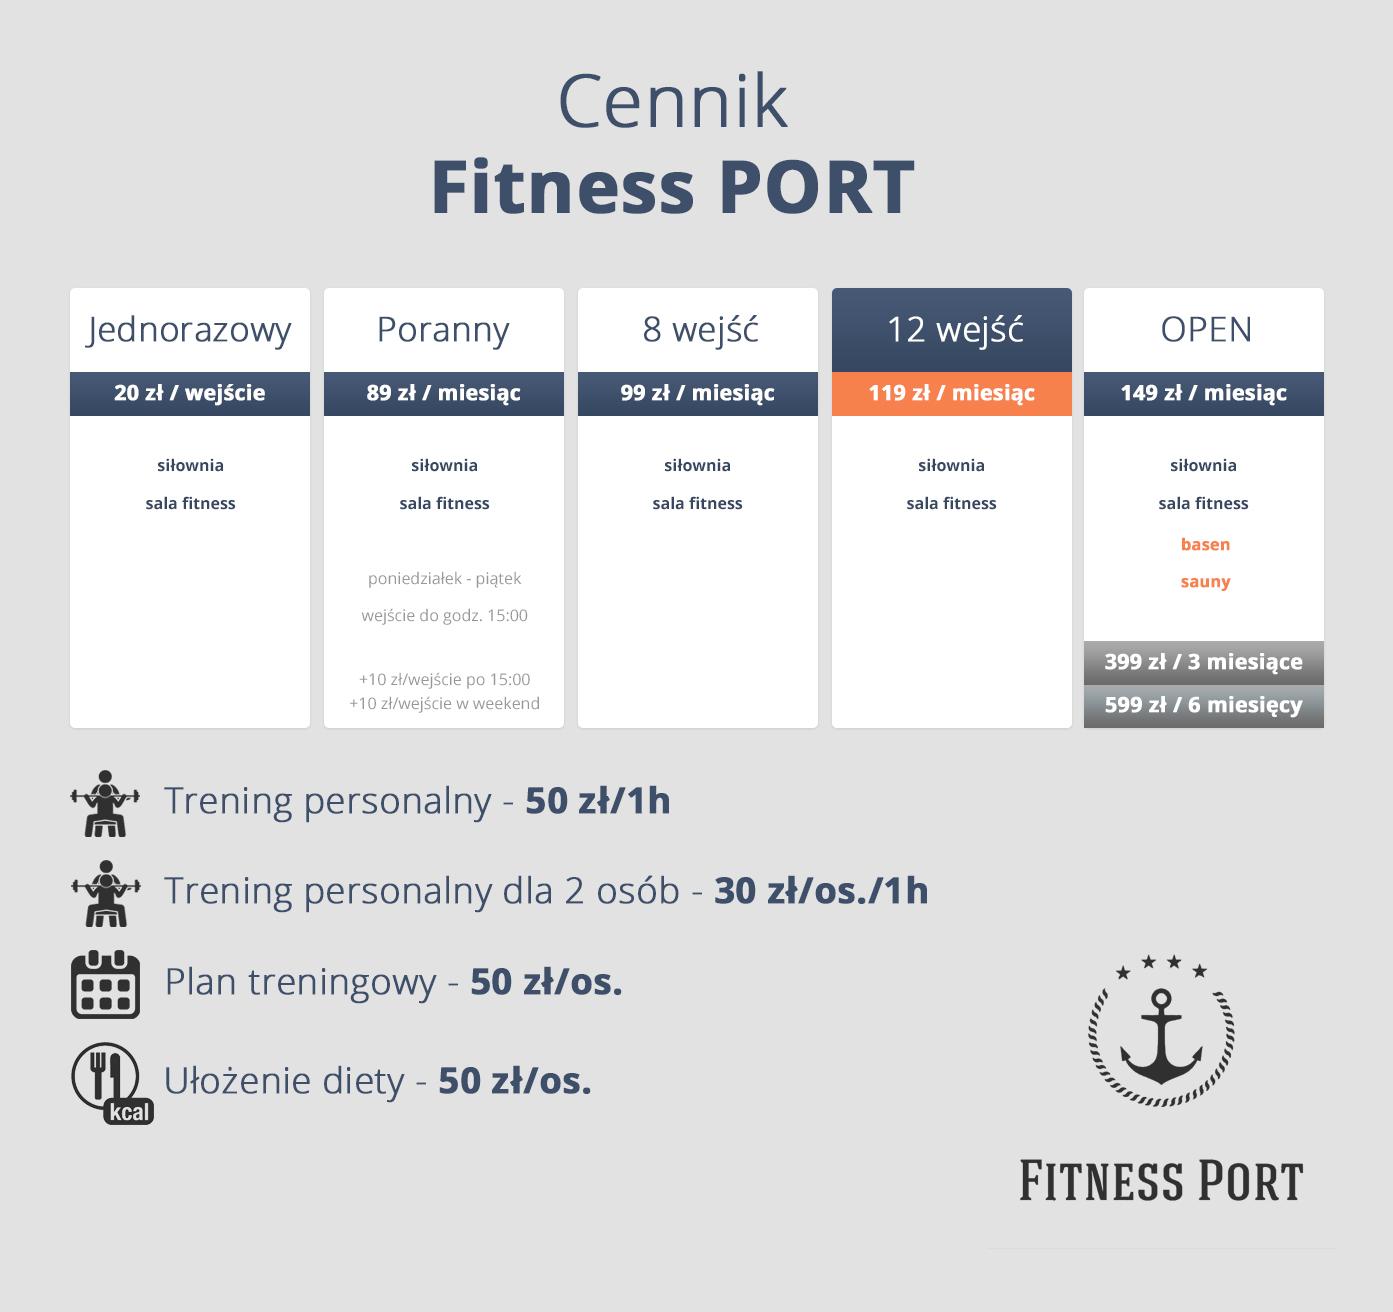 Cennik Fitness Port 2019